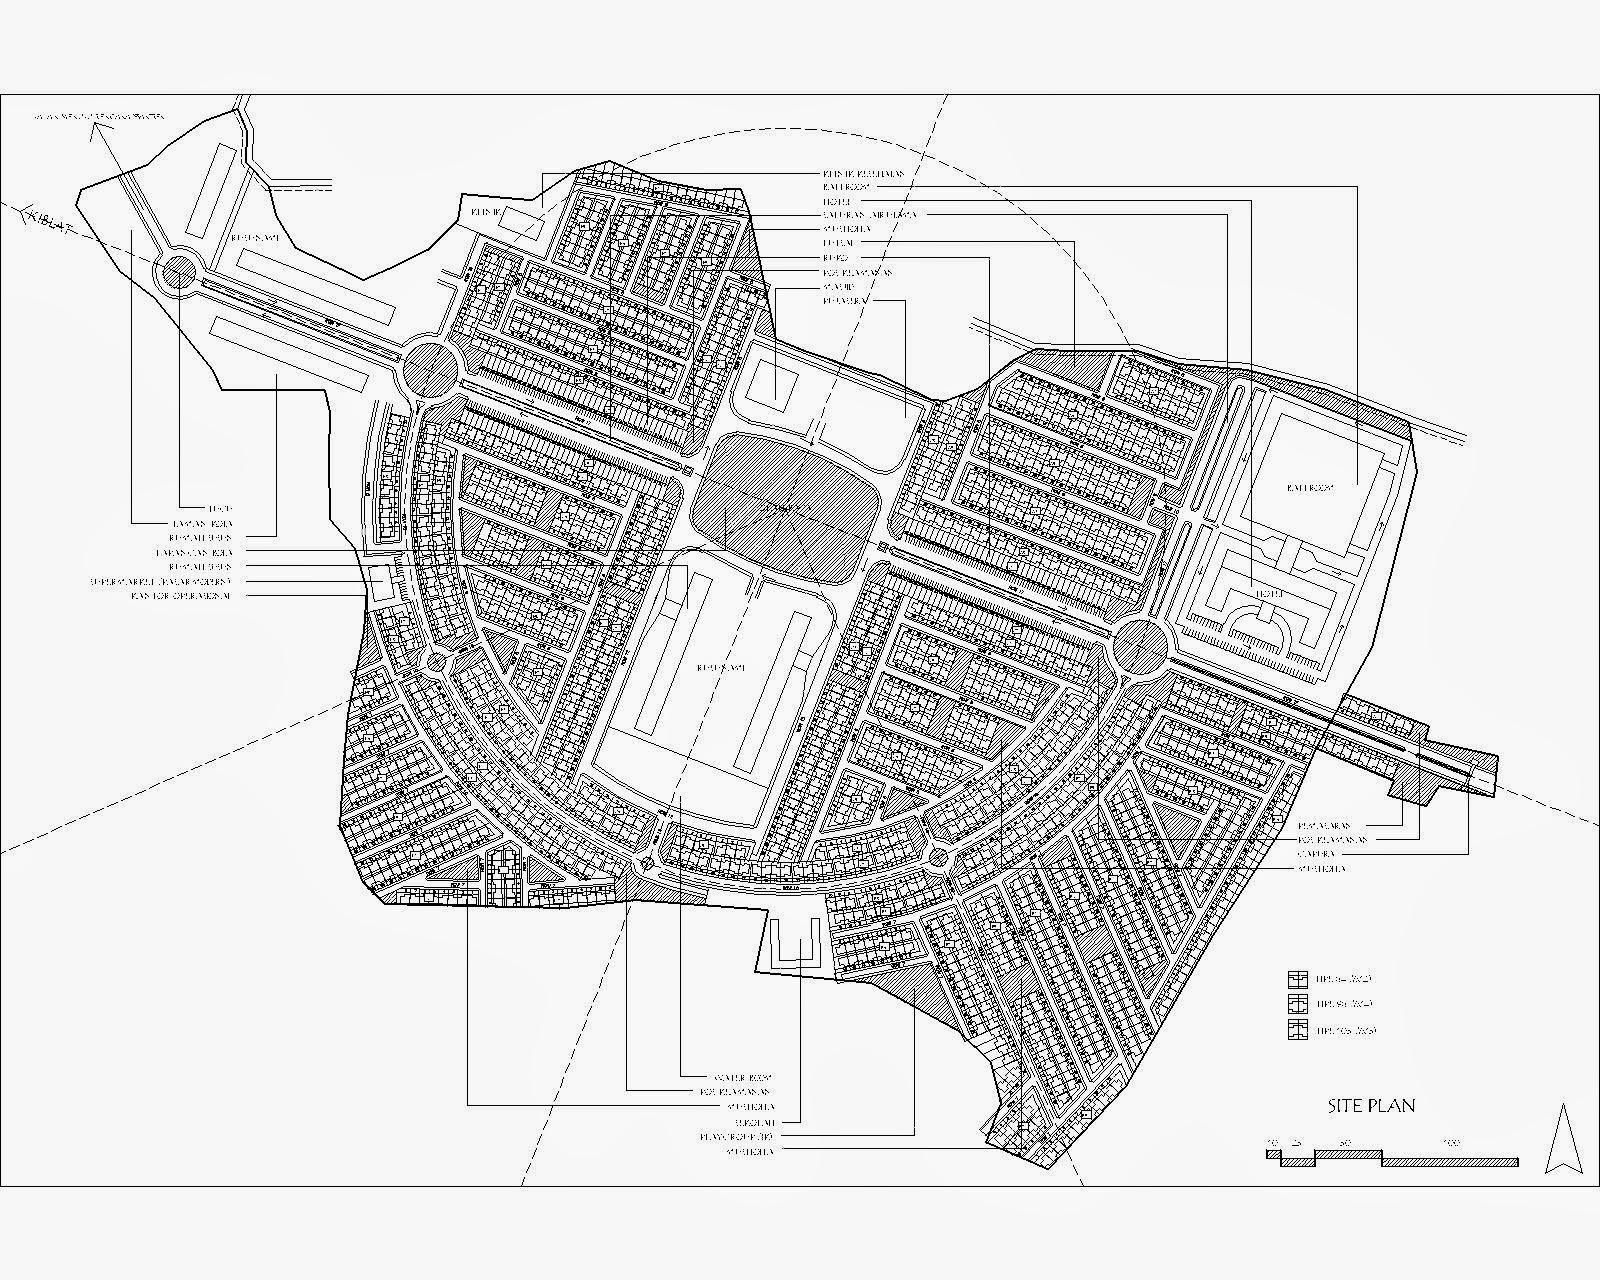 site plan q Savigny-sur-Orge